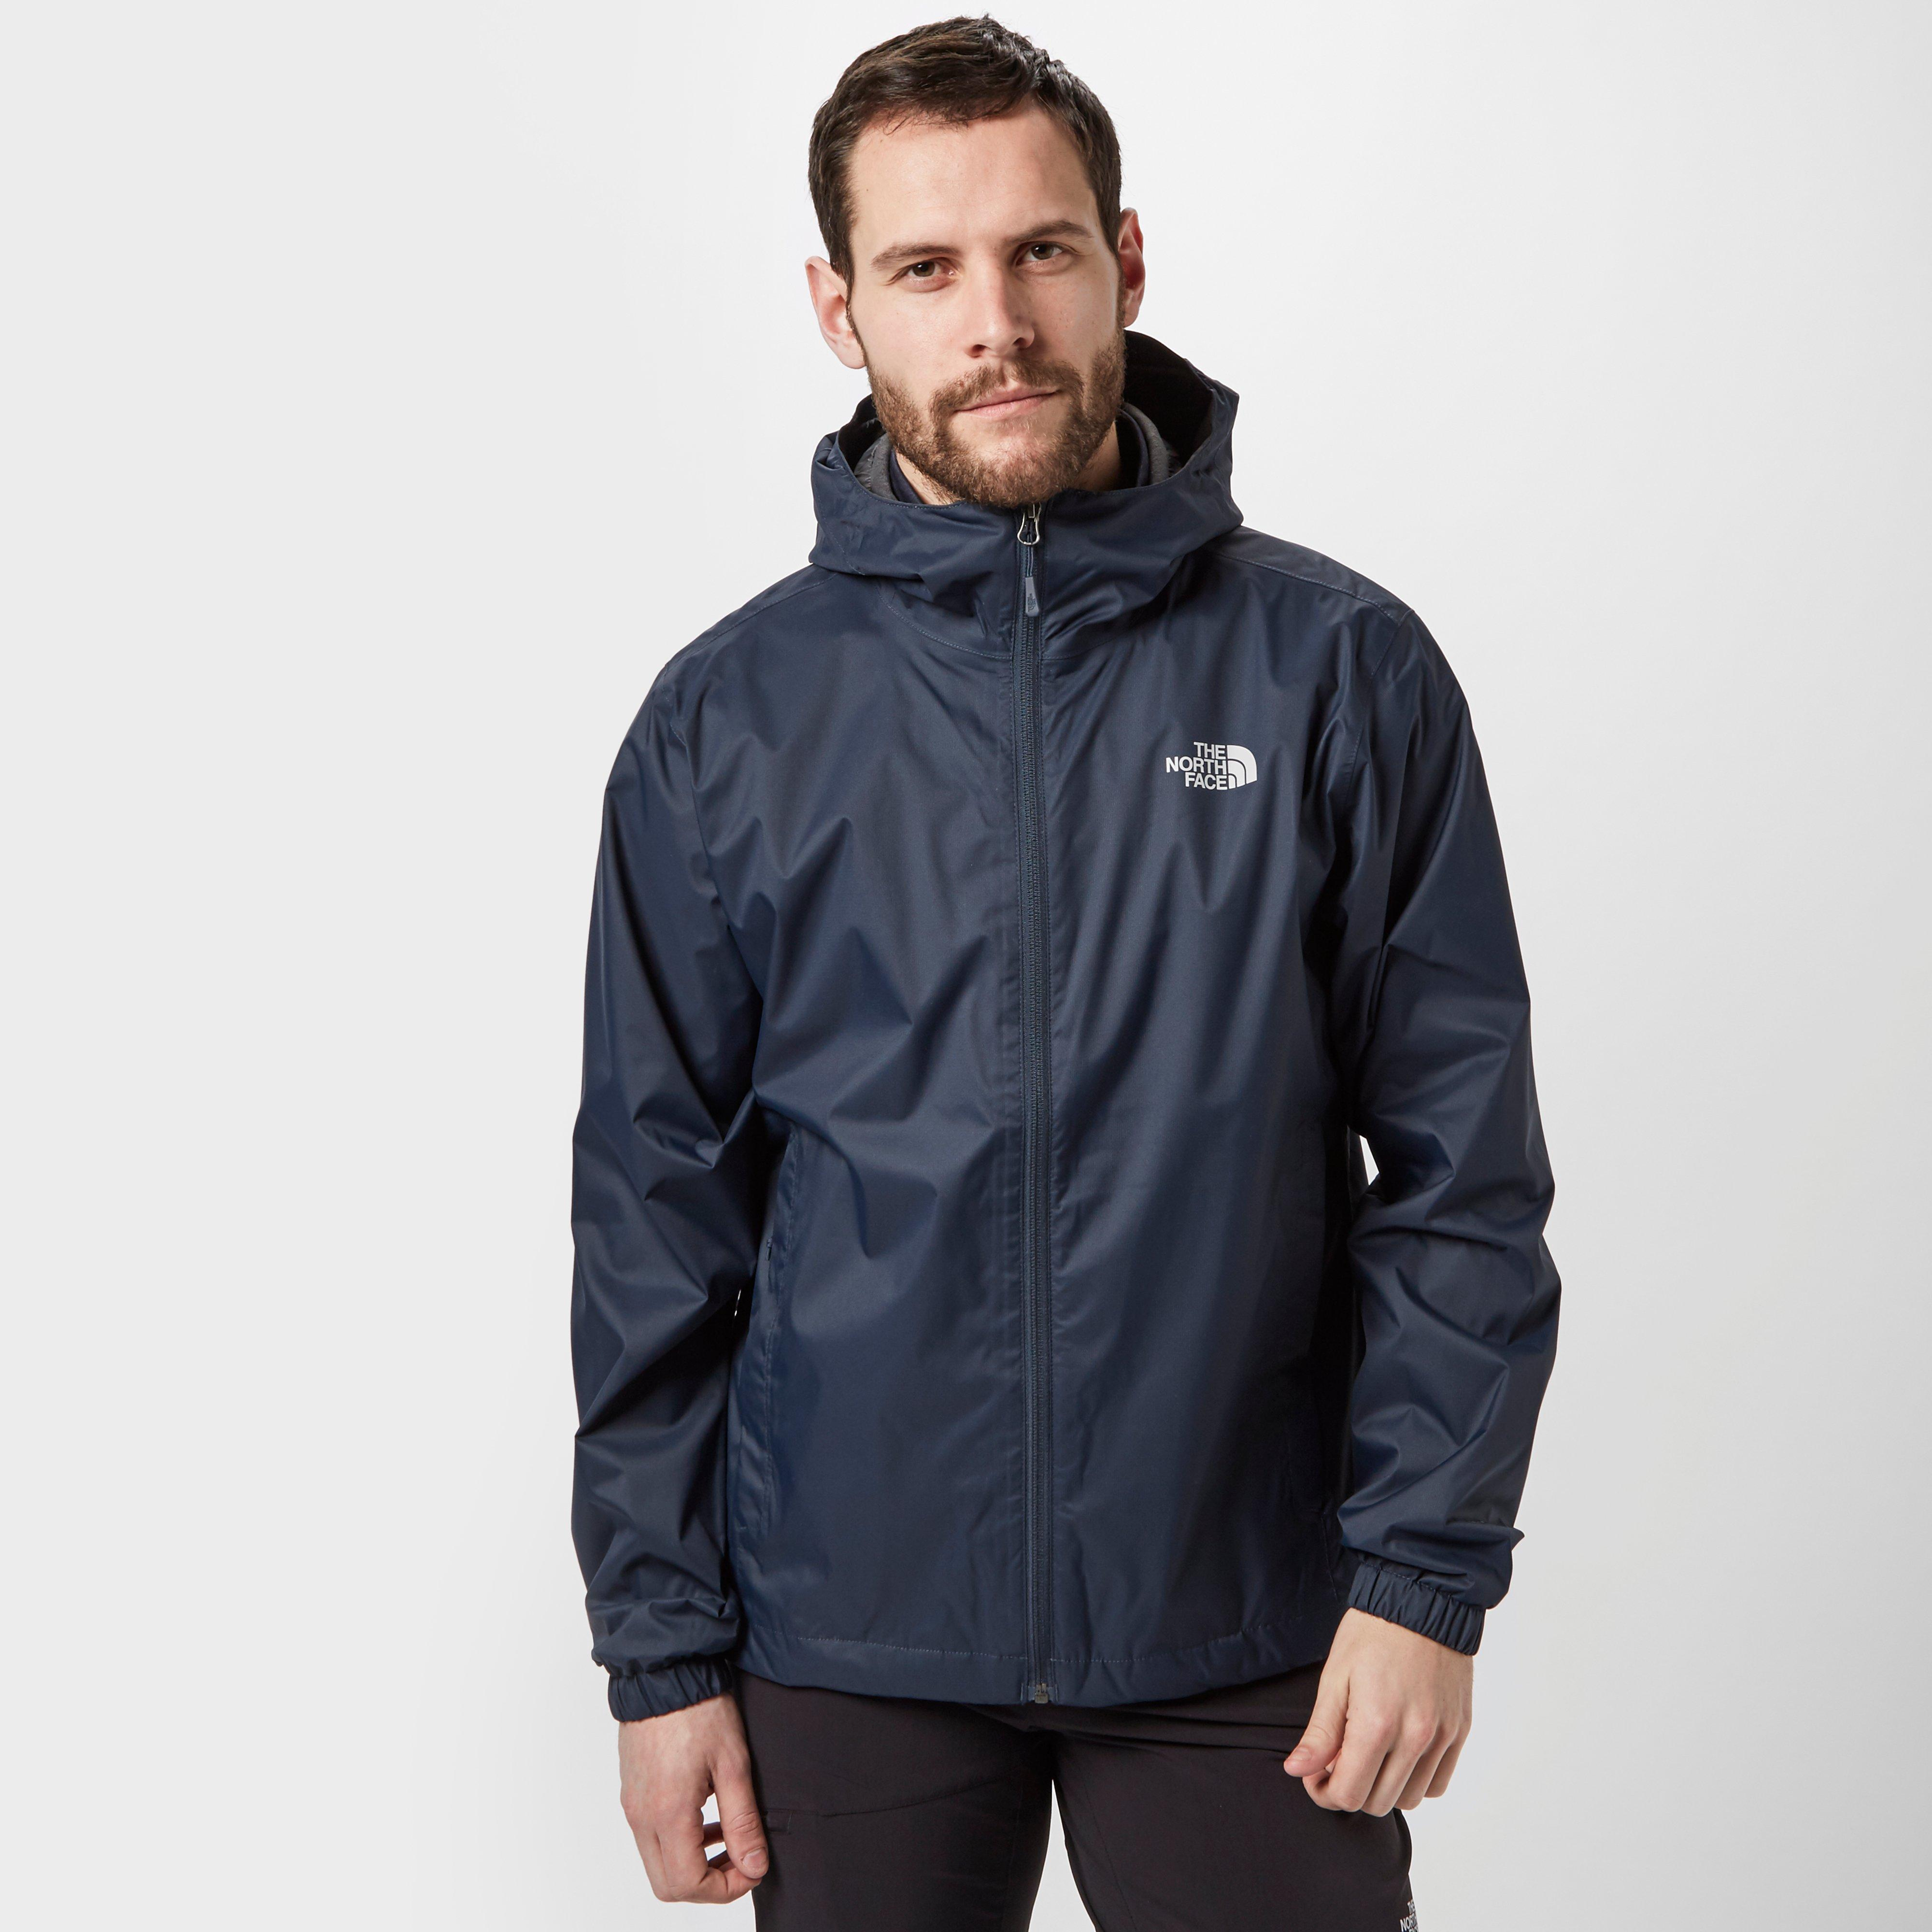 Men's Waterproof Jackets & Rain Coats | Millets